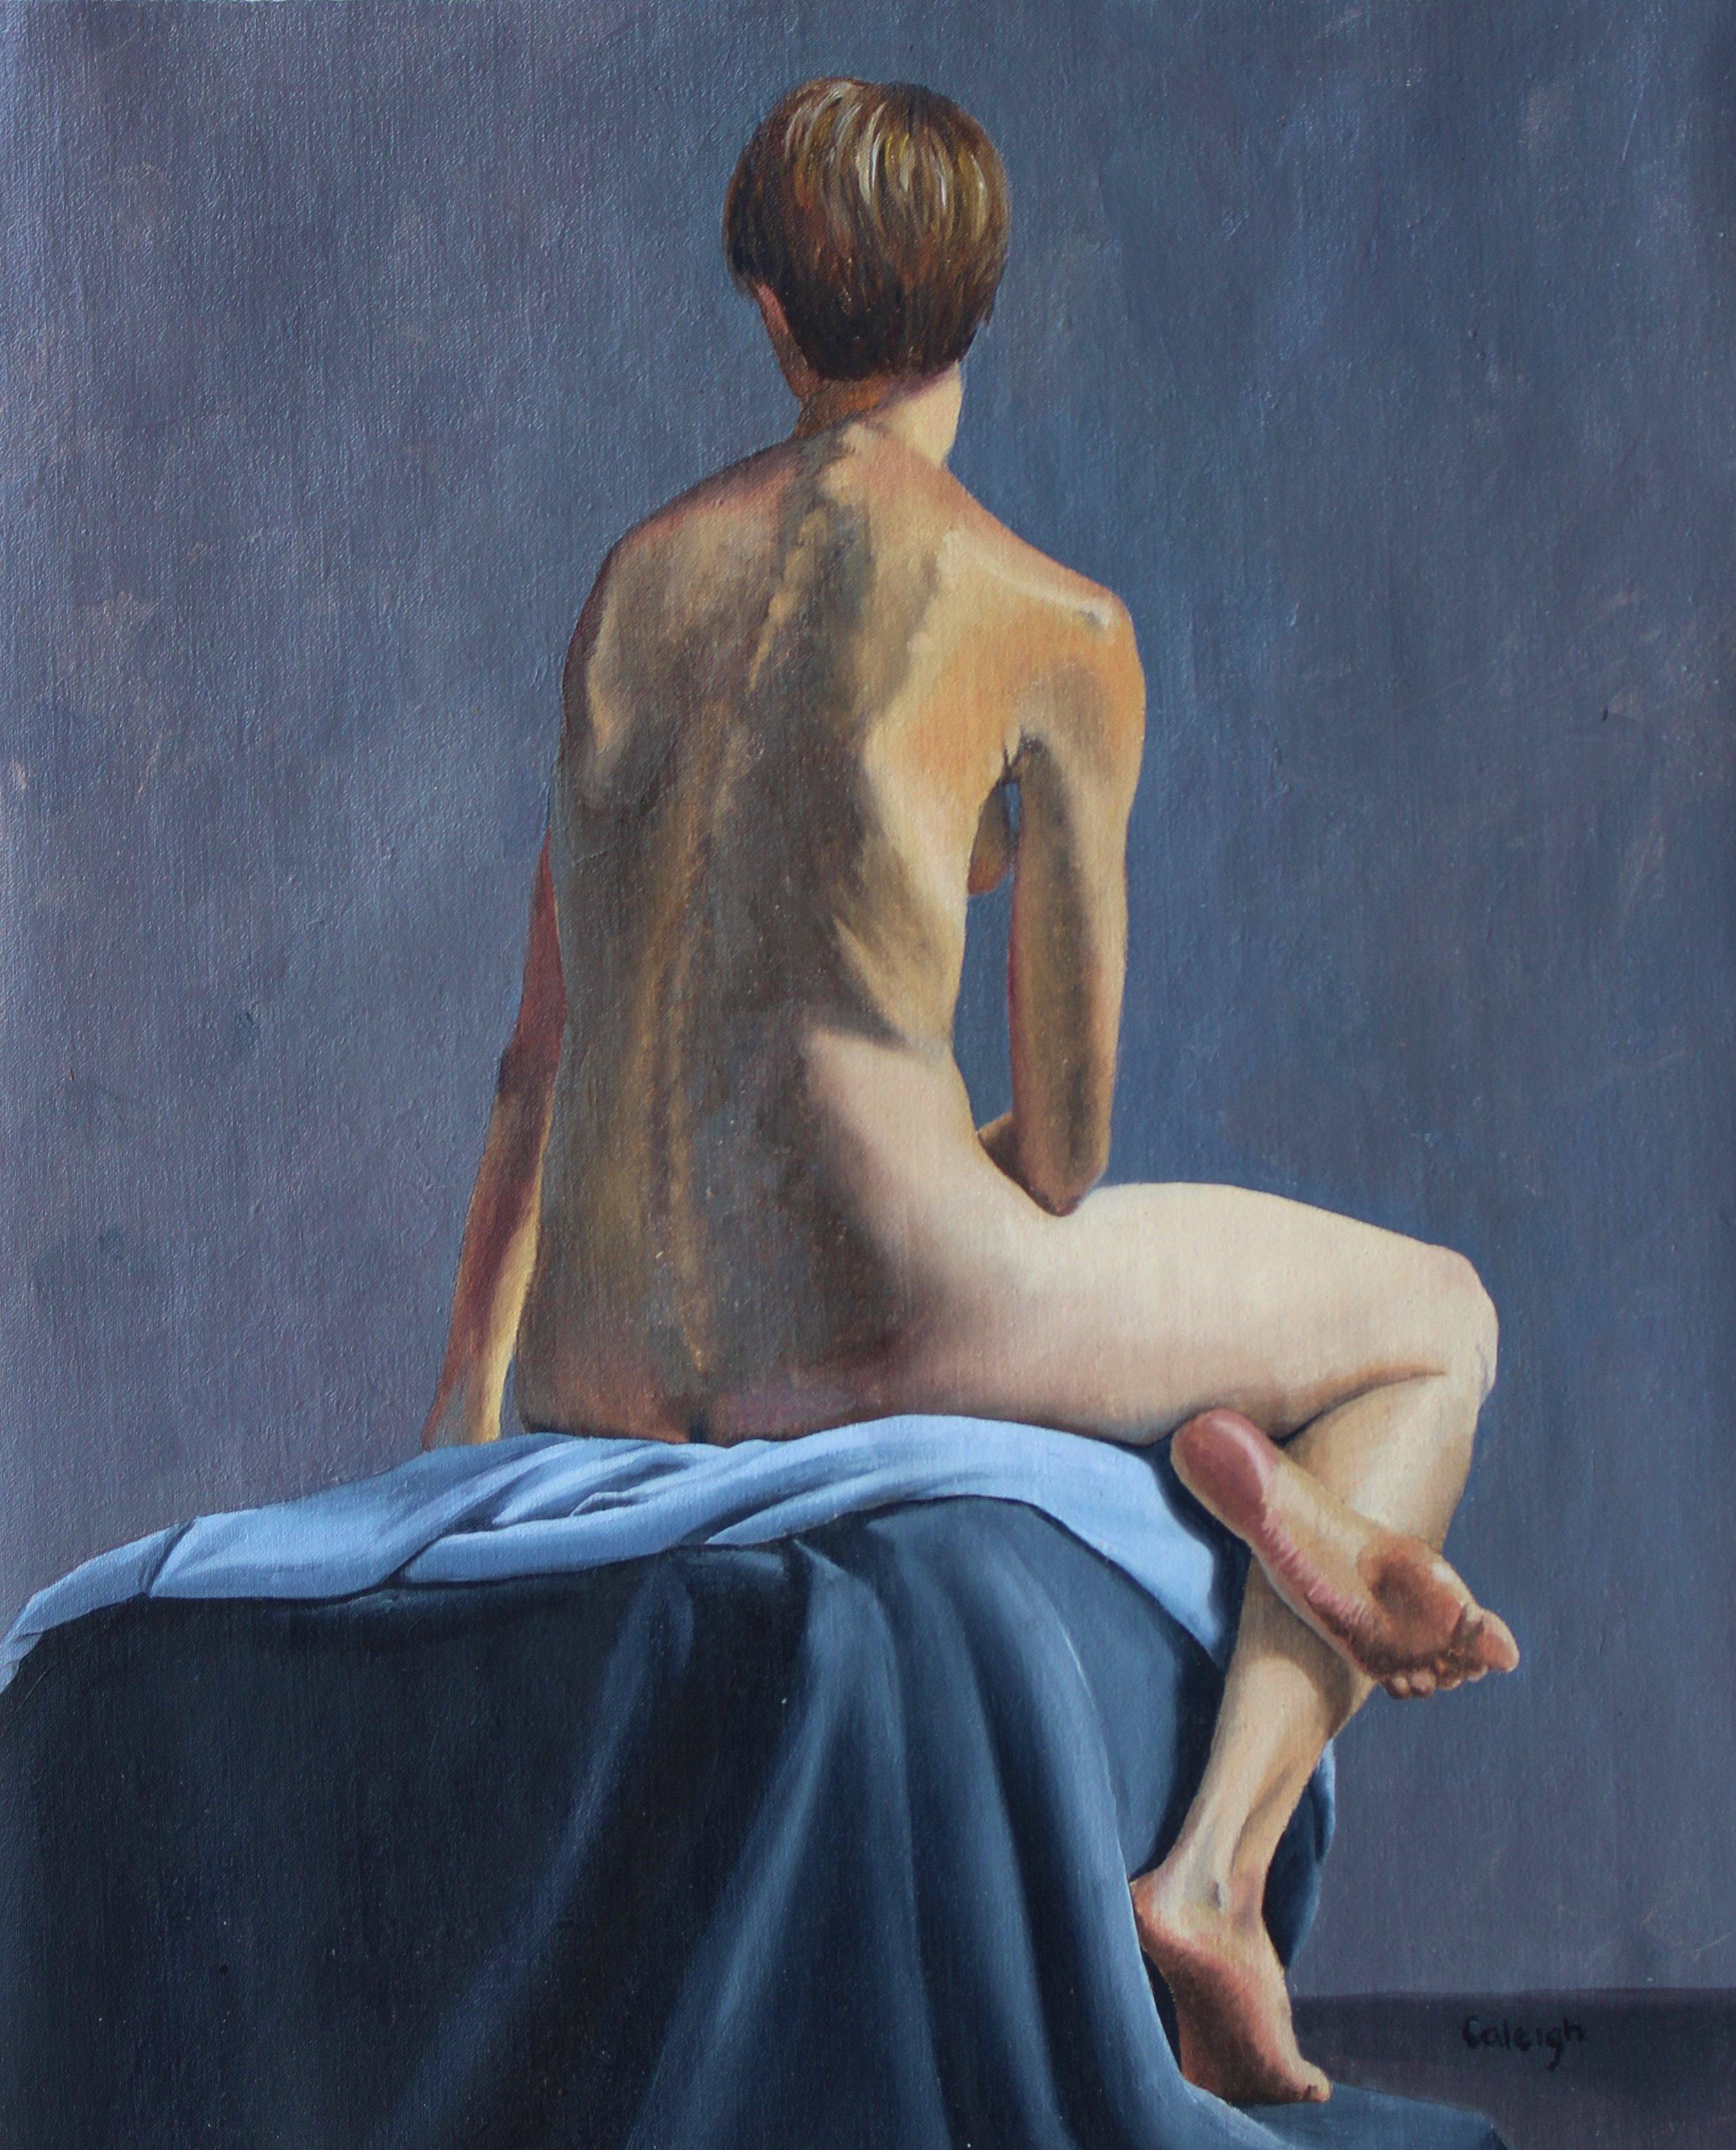 Chiara I   oil on linen  15 x 12.5 inches  2015